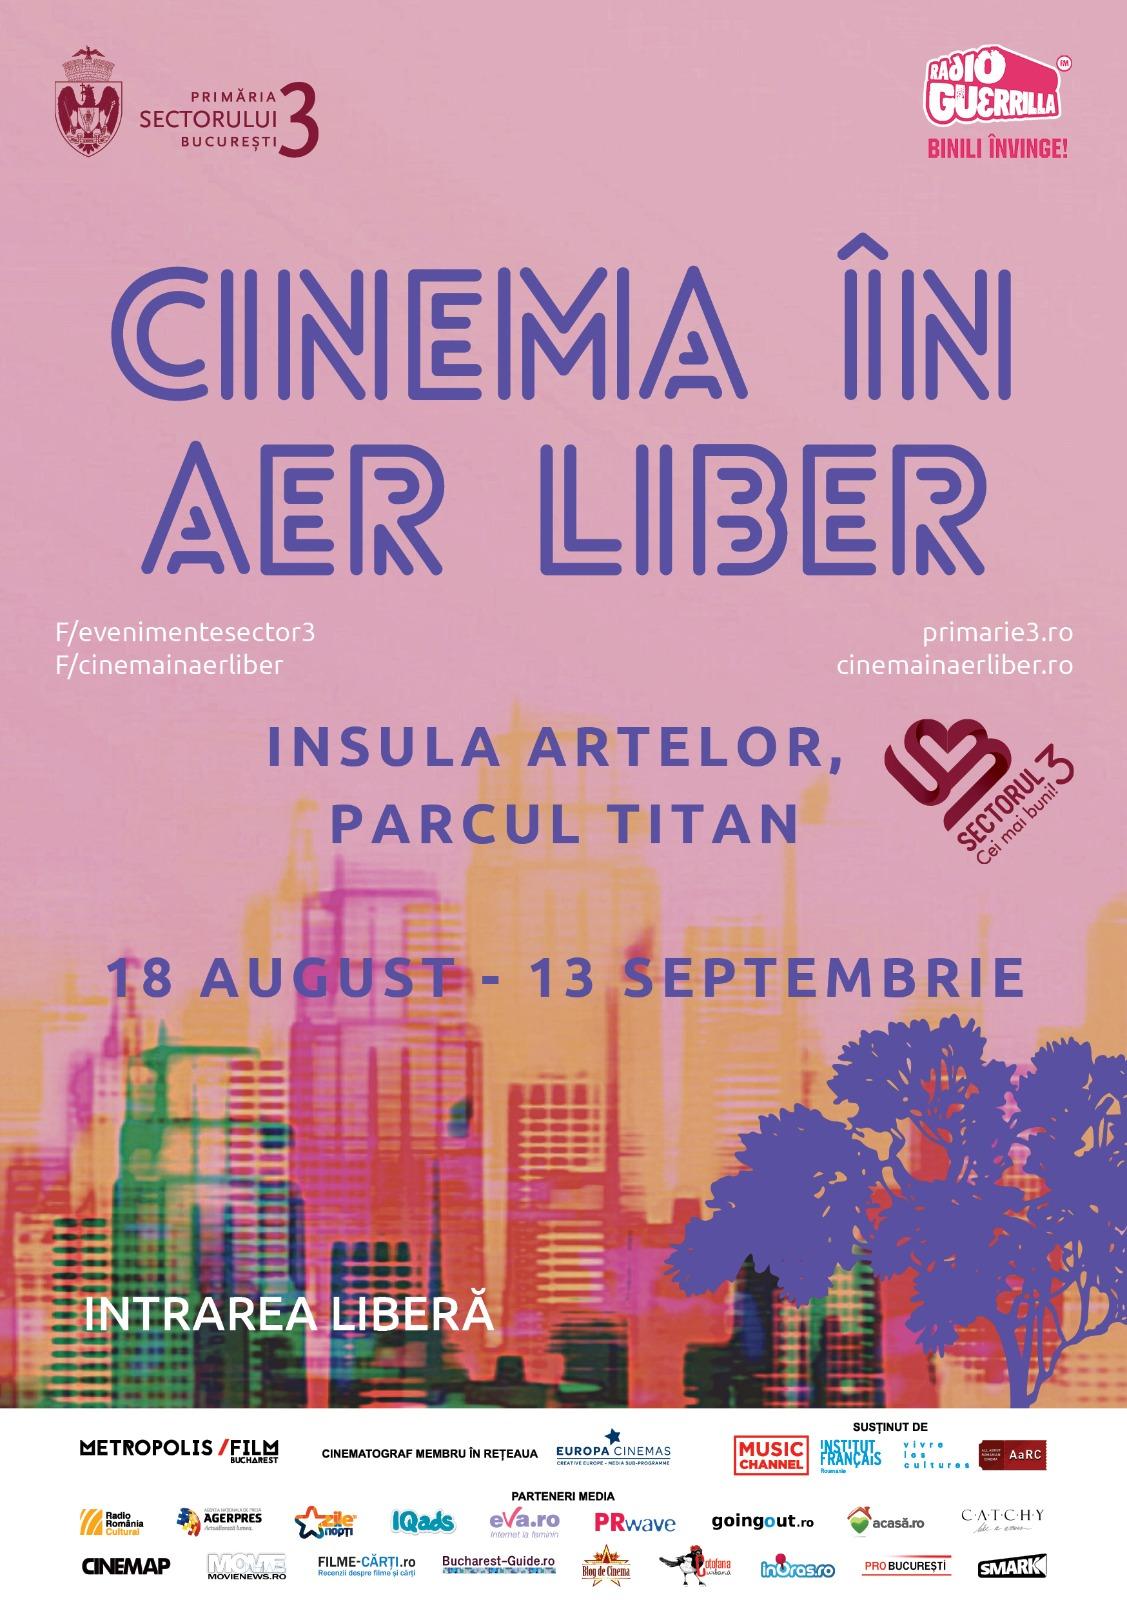 Cinema in aer liber 2020